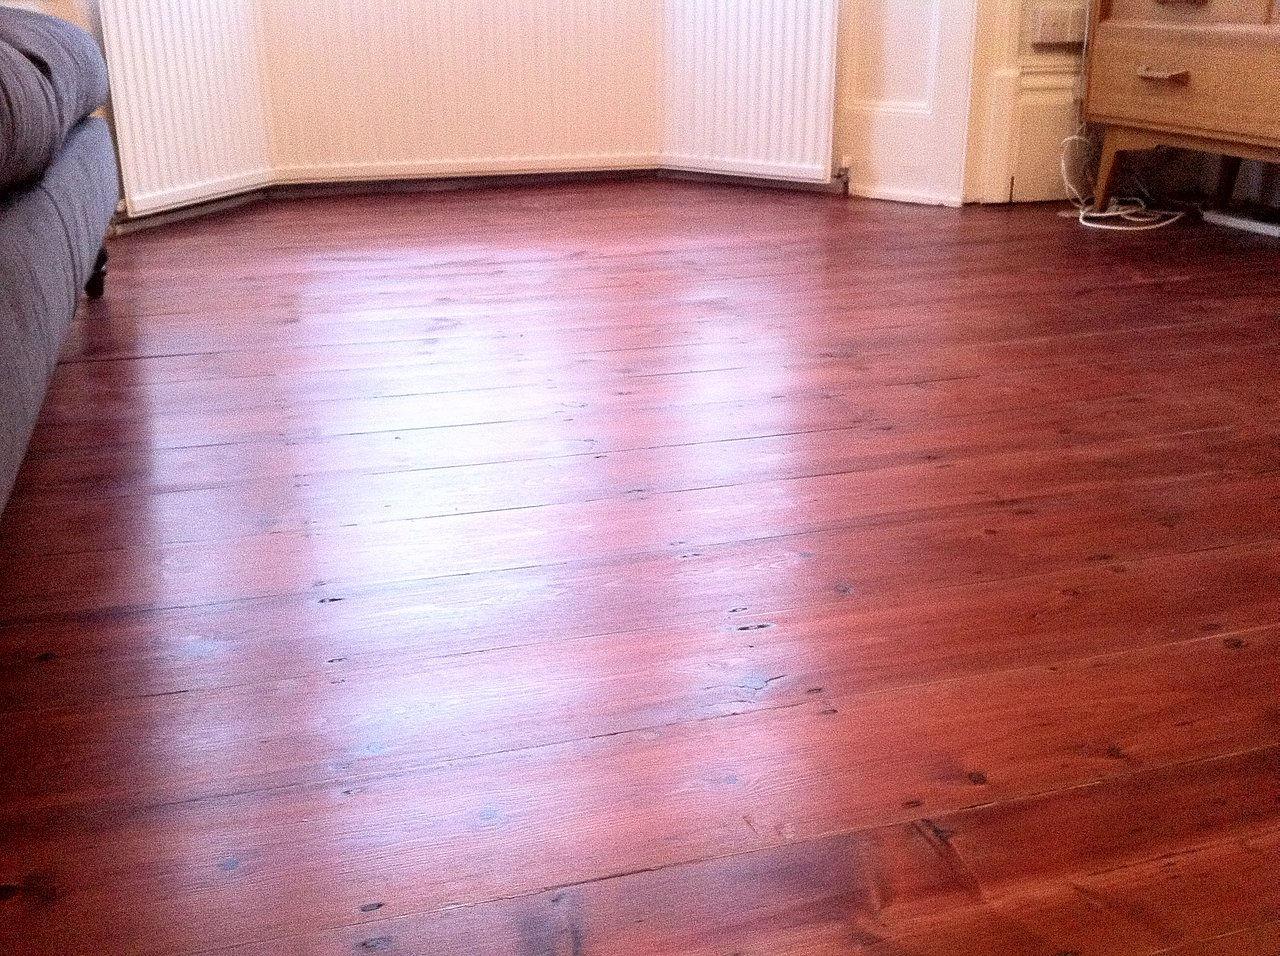 The london wood flooring co - Rustic Floor Stained Cherry Jpg